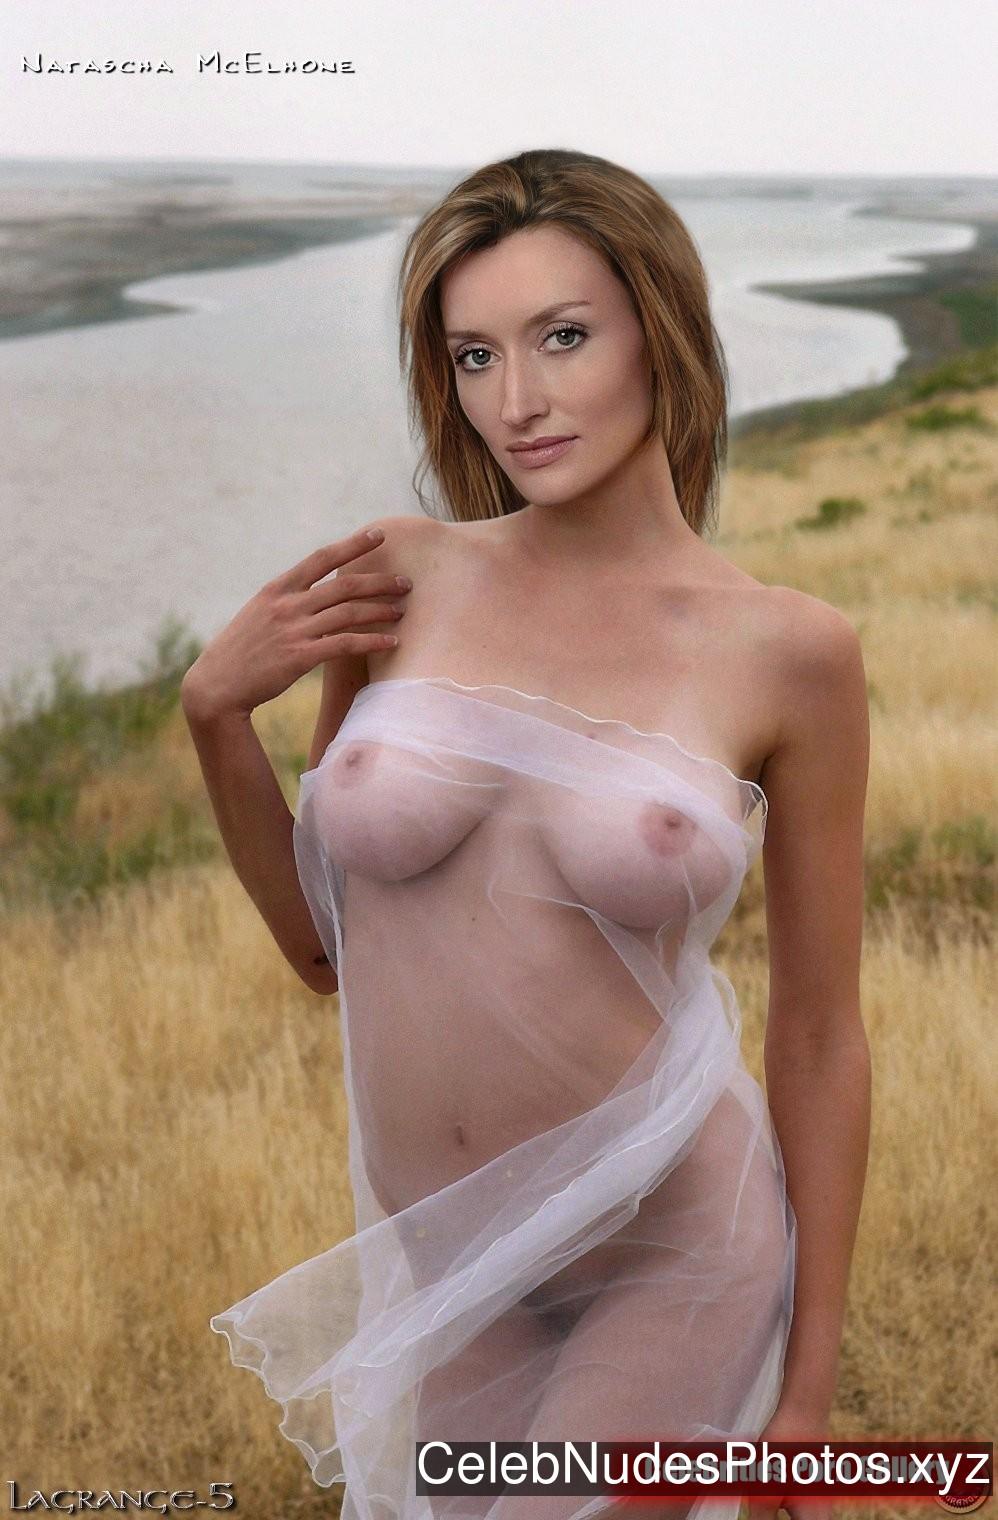 Natascha McElhone Celebs Naked sexy 10